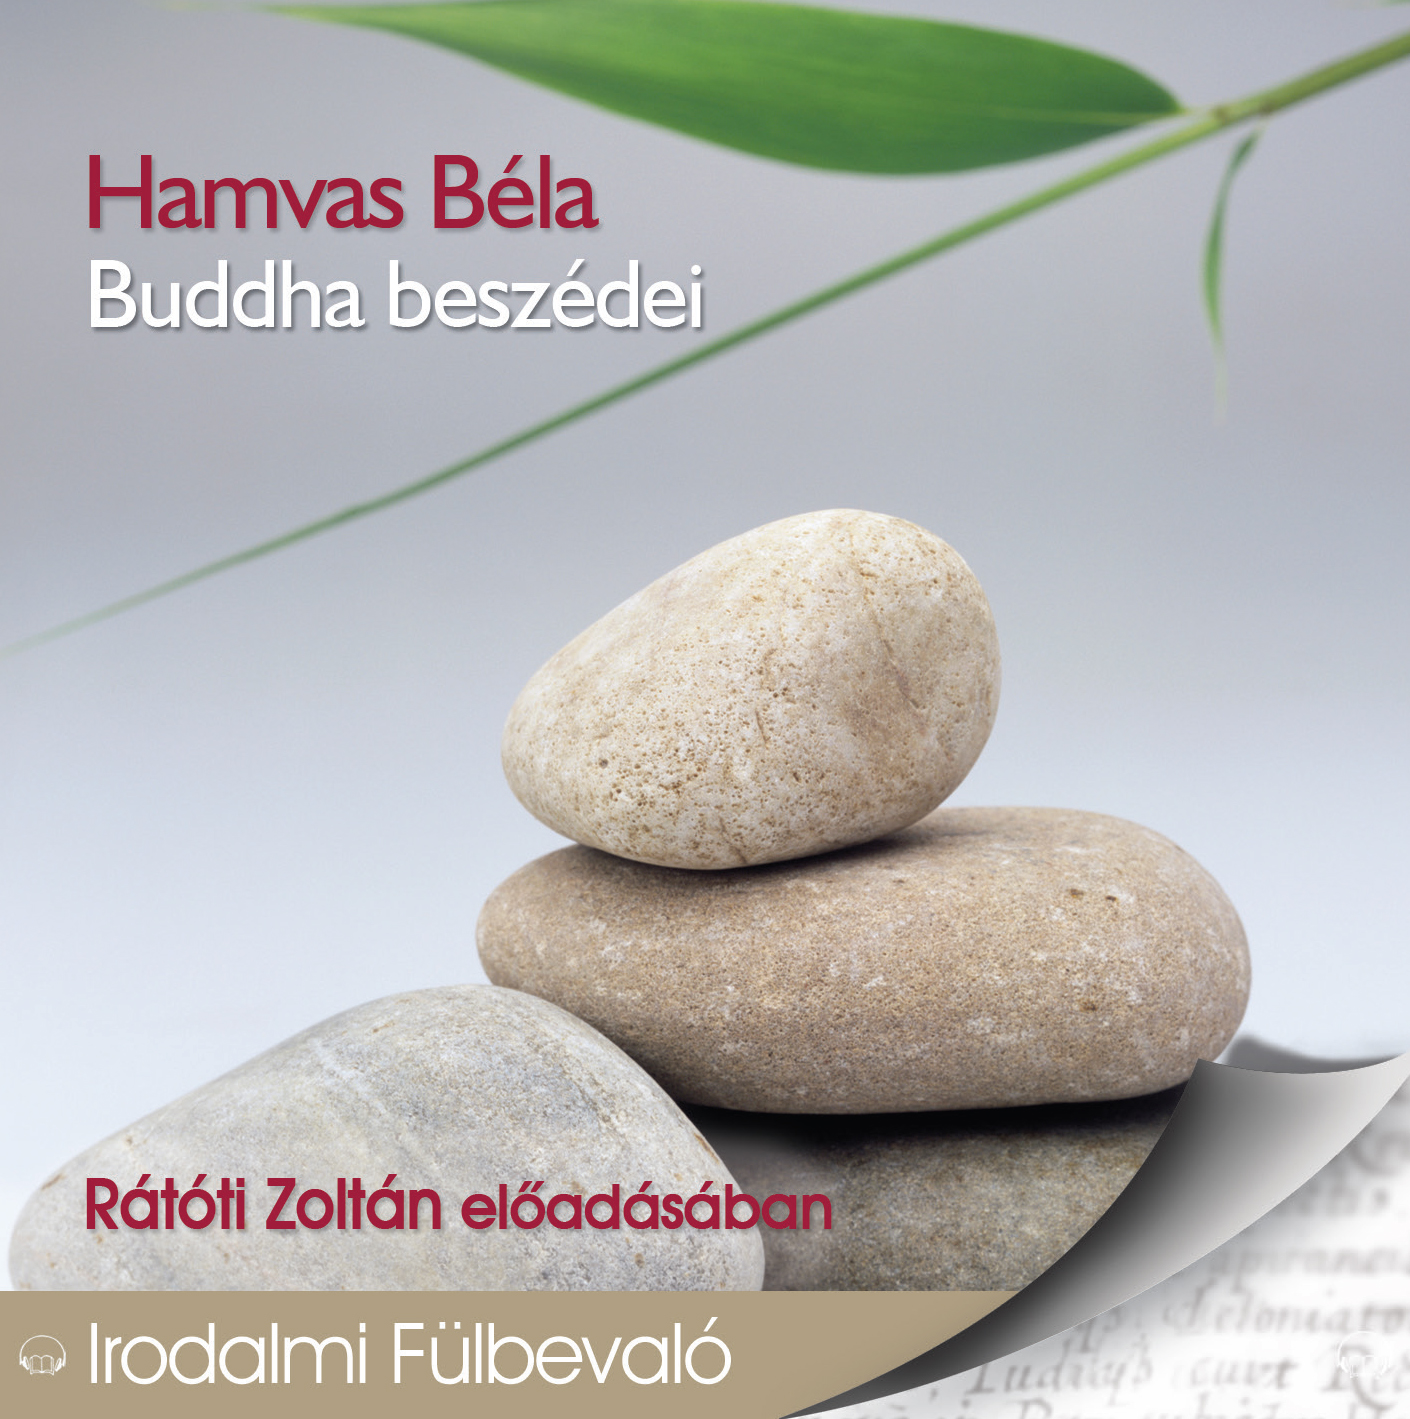 Hamvas Béla: Buddha beszédei